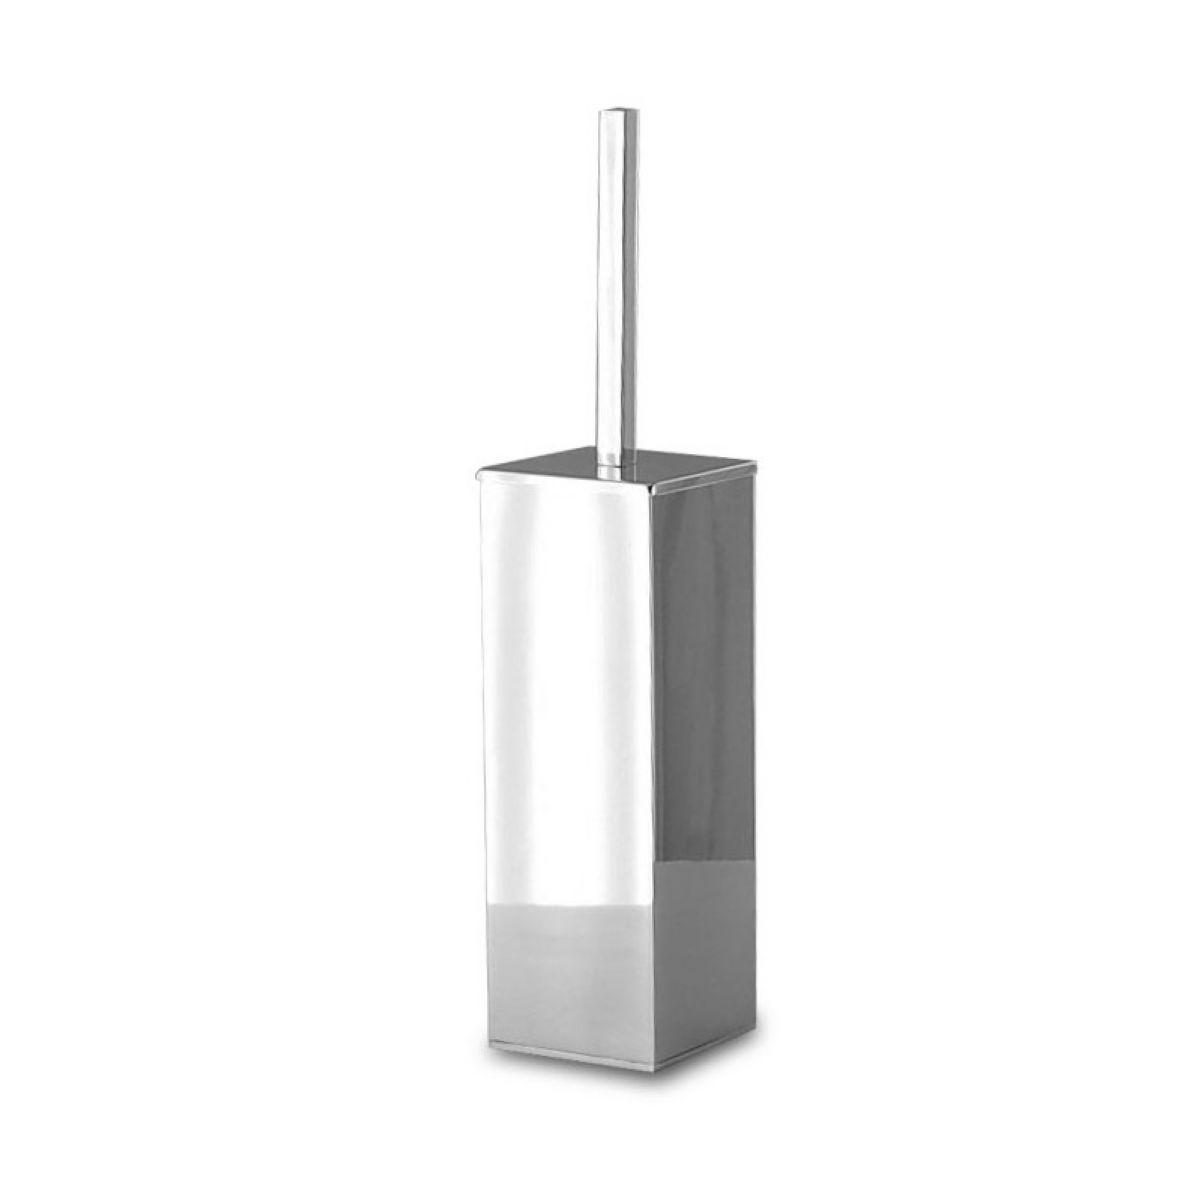 Wall square Toilet brush holder in chrome-plated brass Bottiglioni